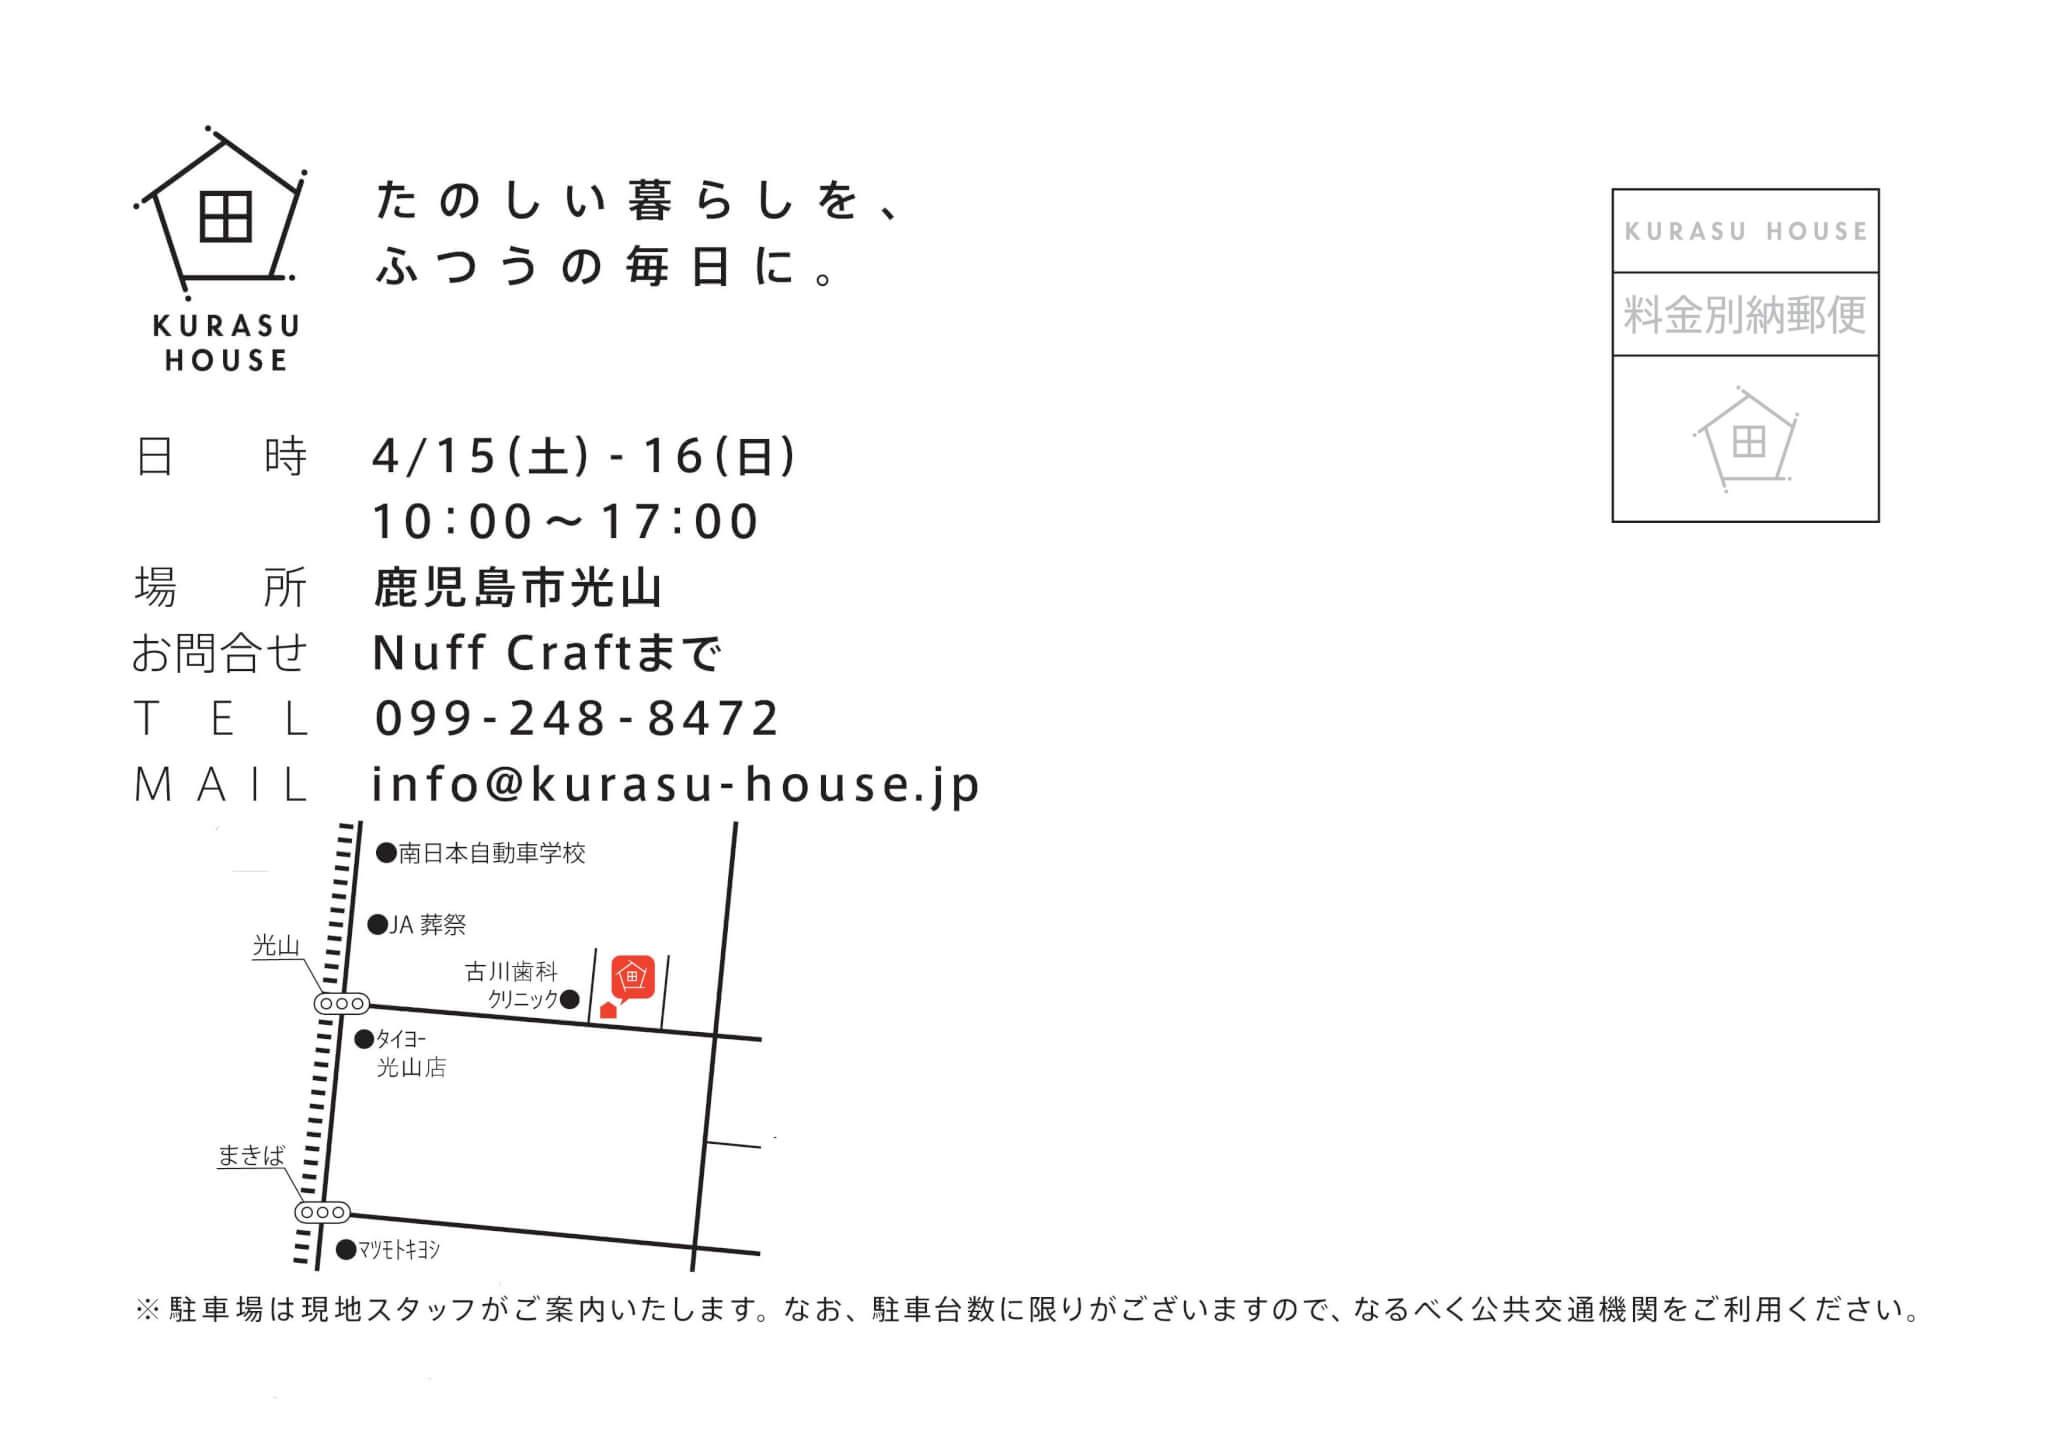 KURASUHOUSE_OpenHouse_rough_170415表